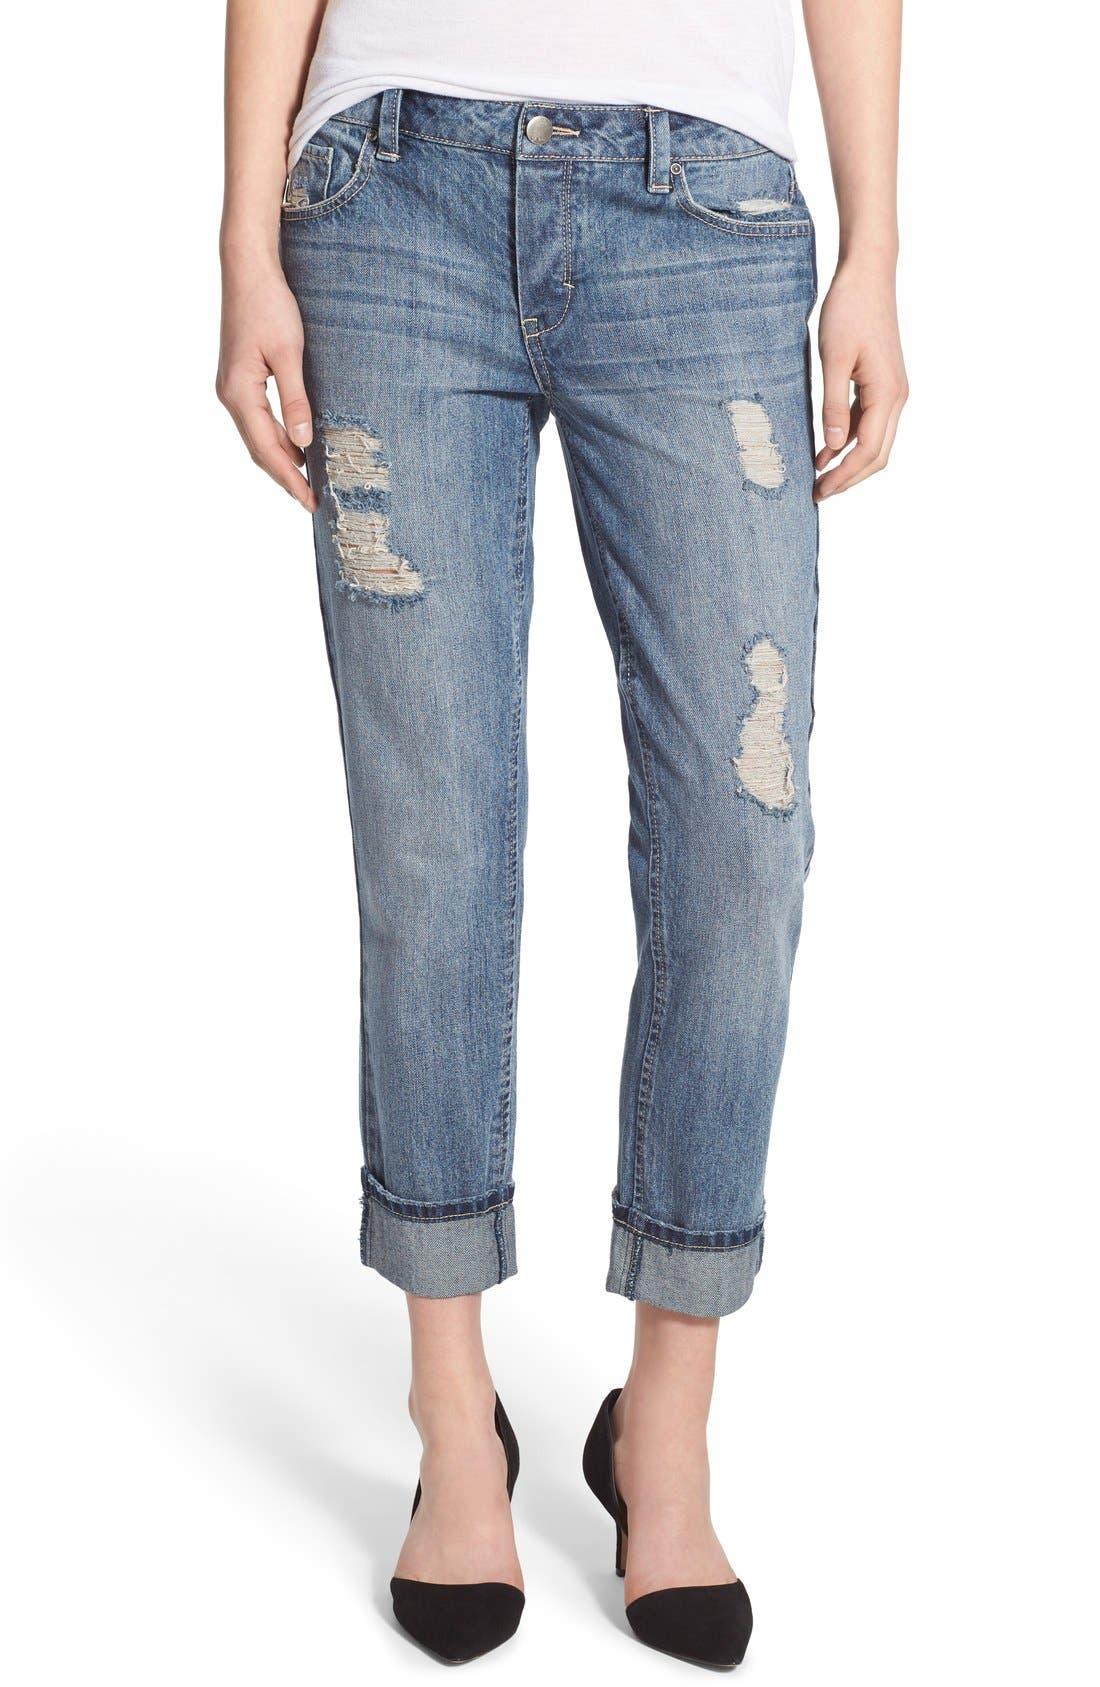 Alternate Image 1 Selected - Generra Distressed Slim Boyfriend Jeans (Carren)